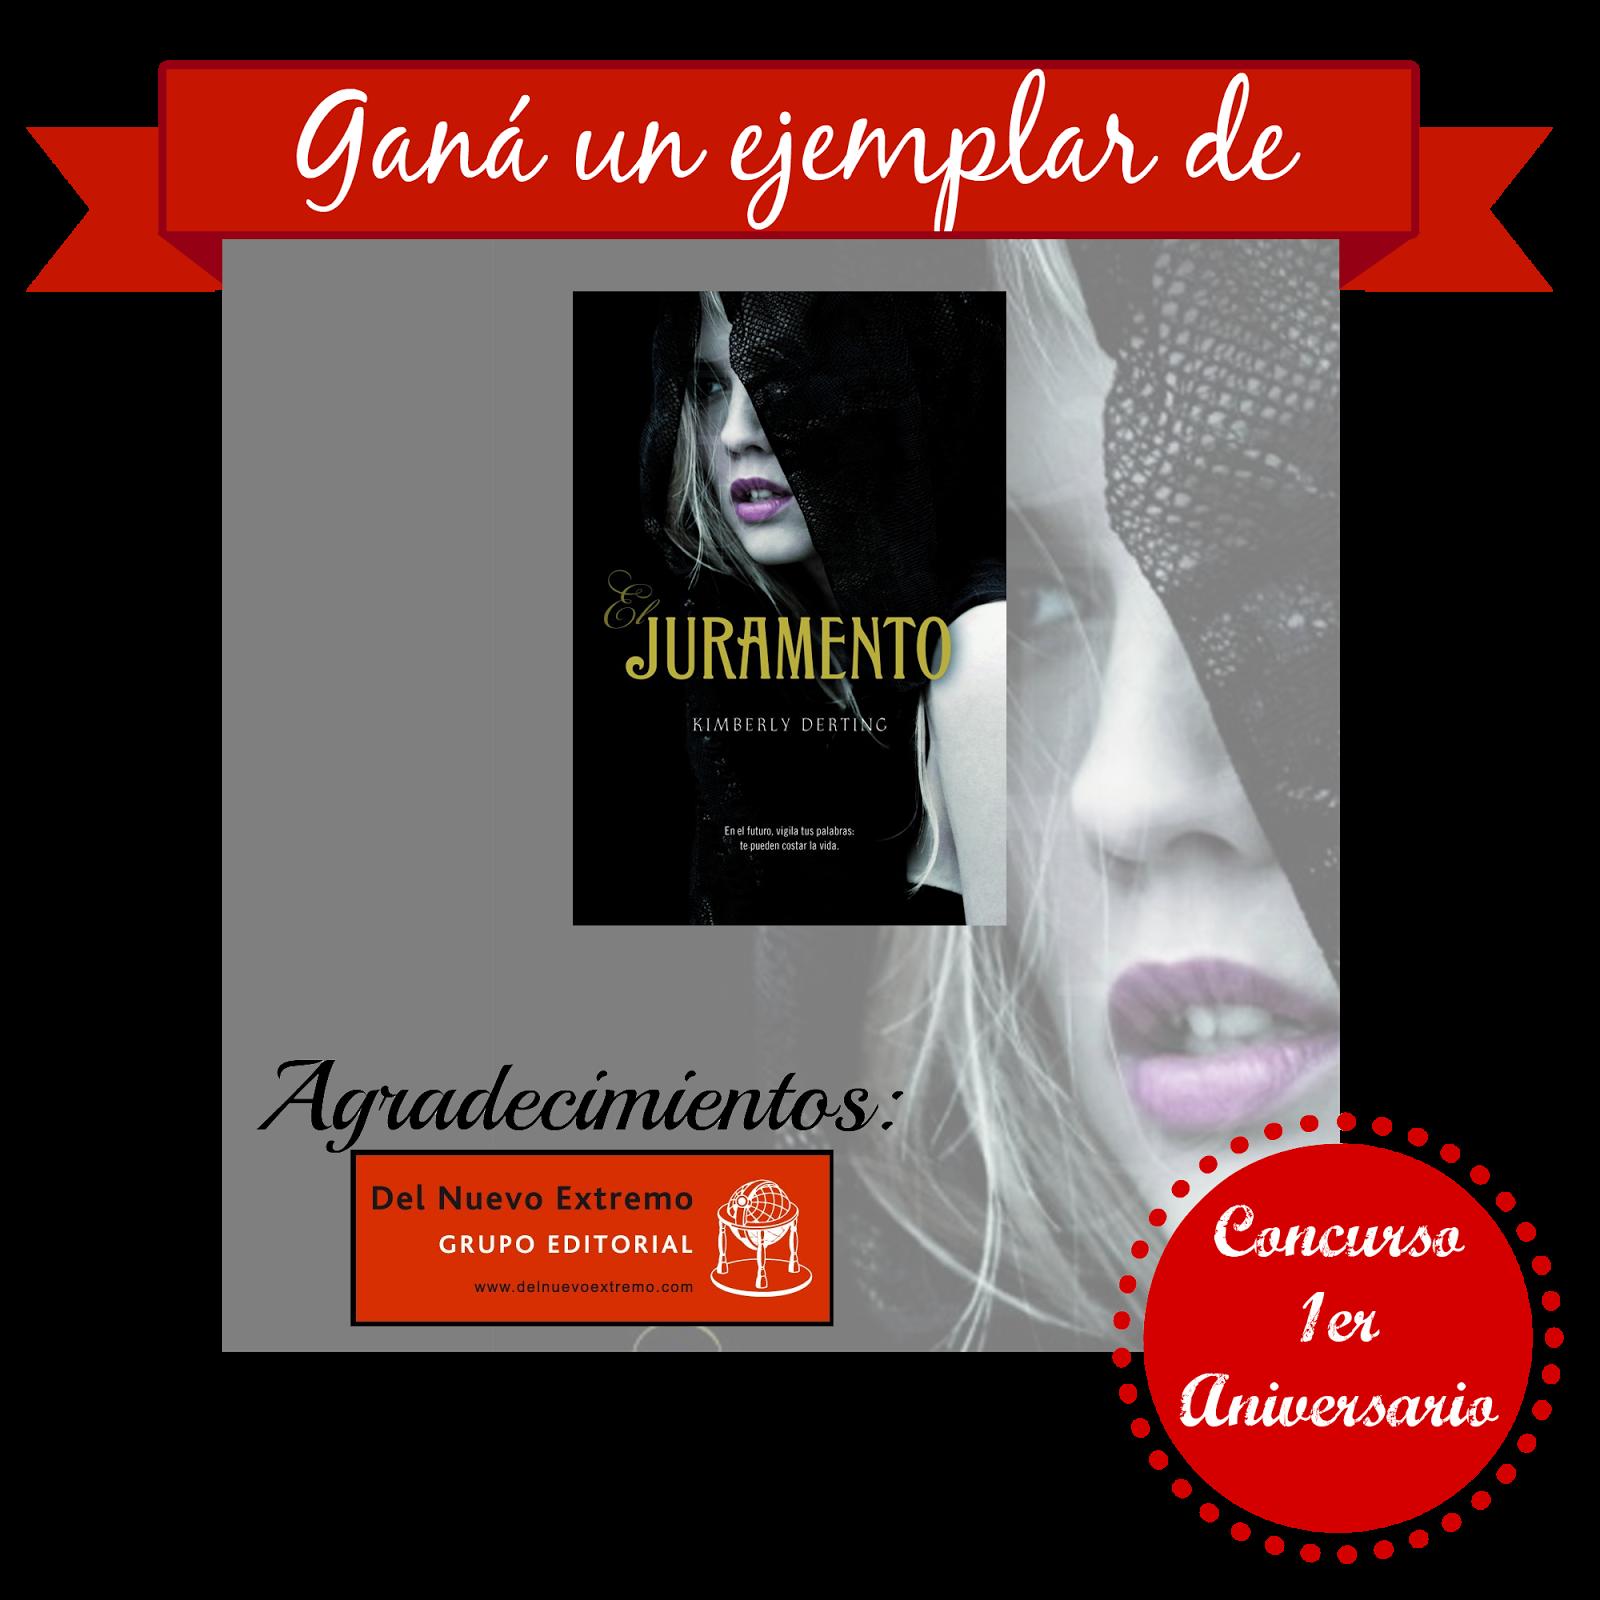 http://www.atrapadoenlalectura.com.ar/2014/01/concurso-aniversario-1-el-juramento-de.html?showComment=1392223120577#c5029773739762530699